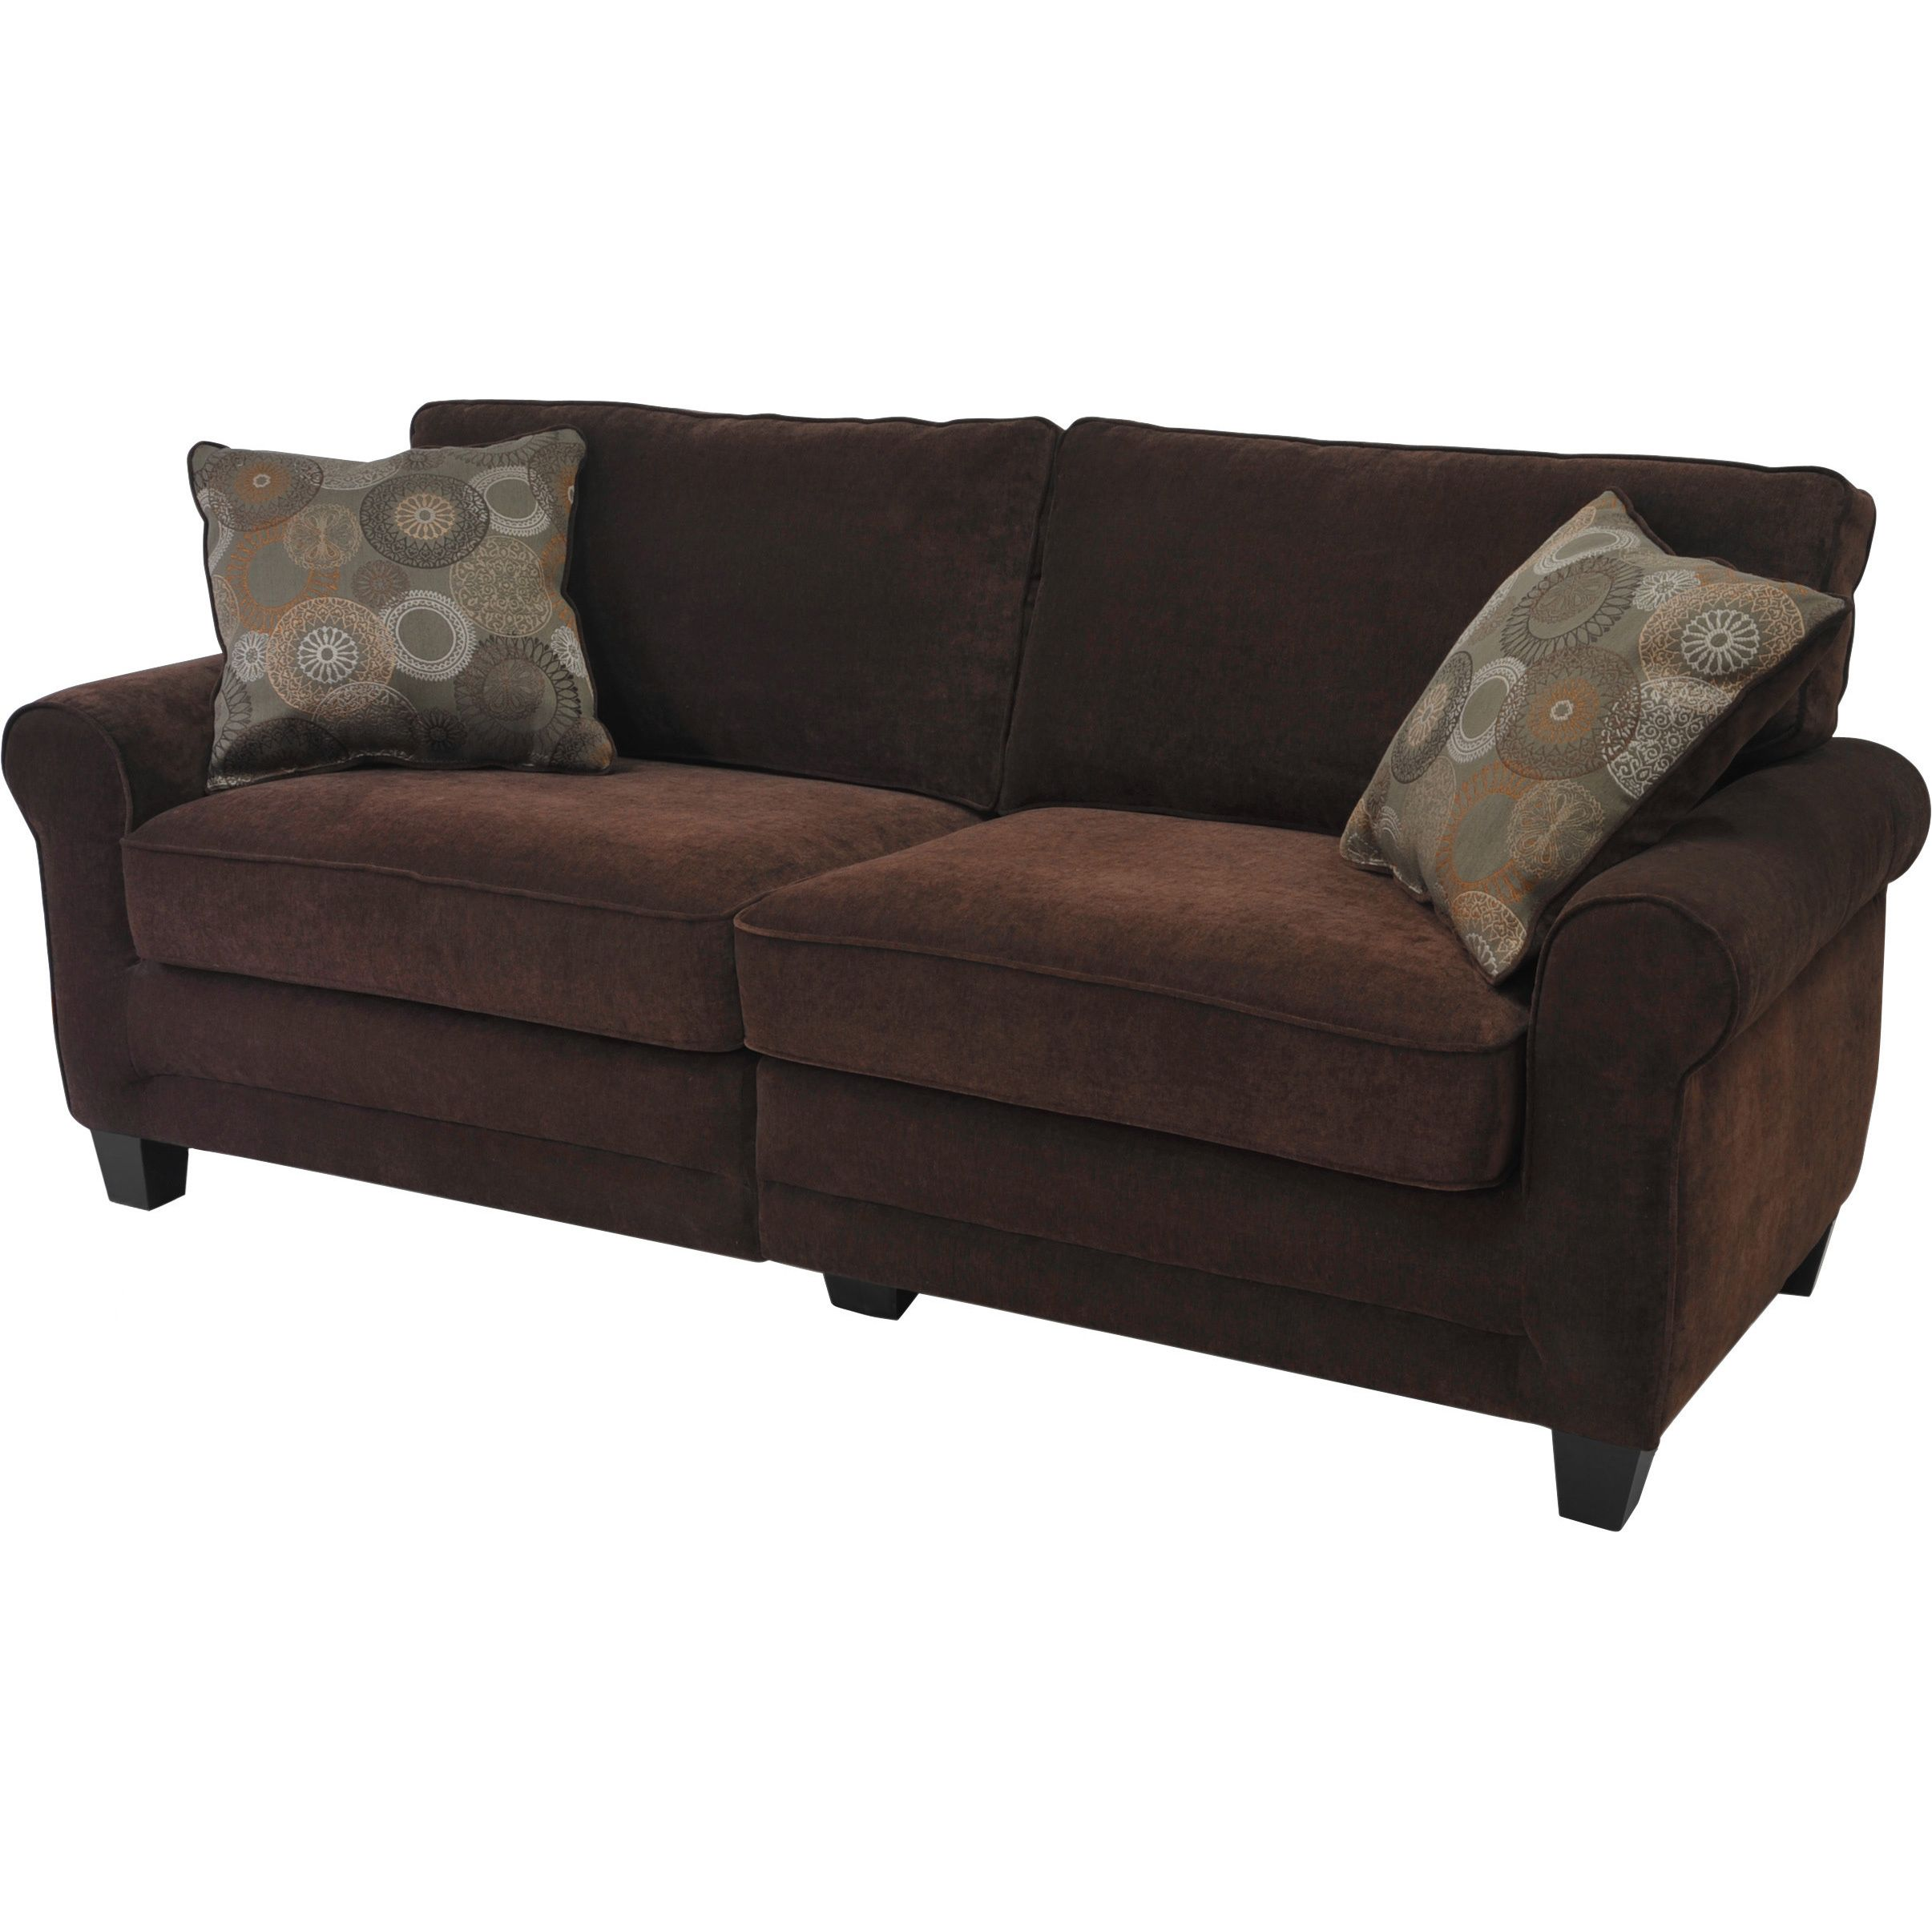 serta trinidad collection chocolate deluxe sofa overstock com rh pinterest com au